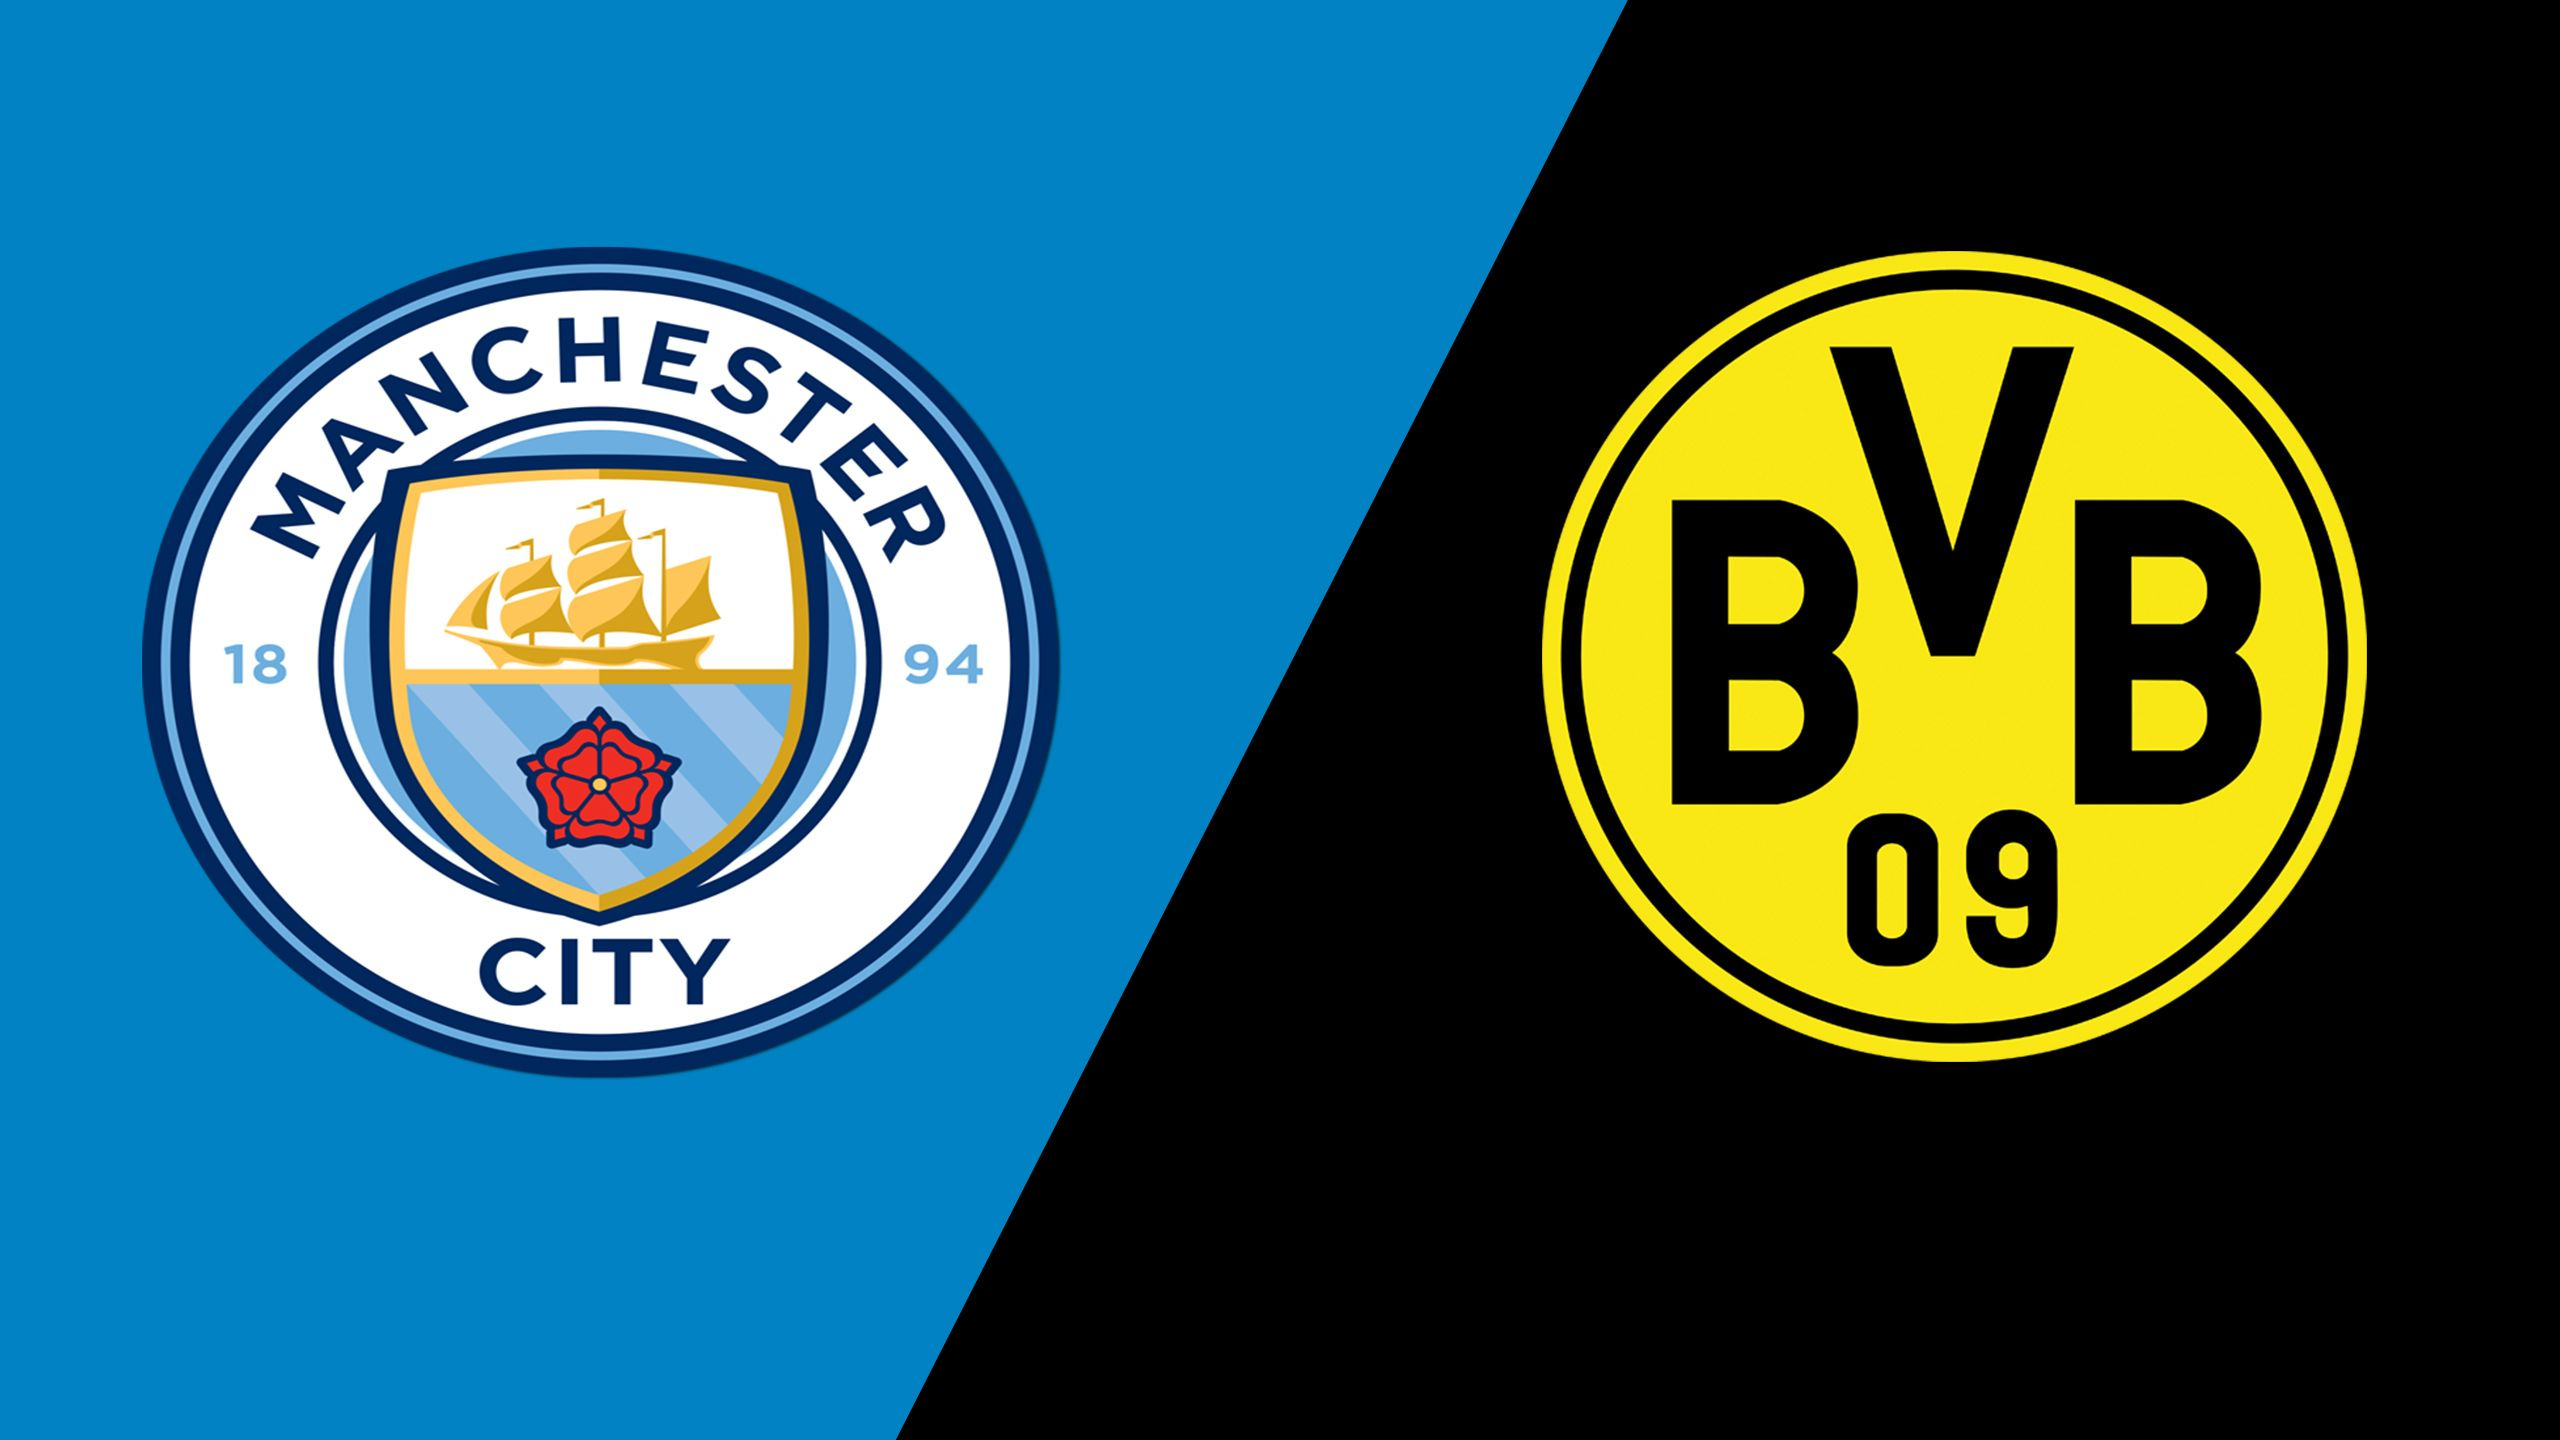 In Spanish - Manchester City vs. Borussia Dortmund (International Champions Cup) (re-air)